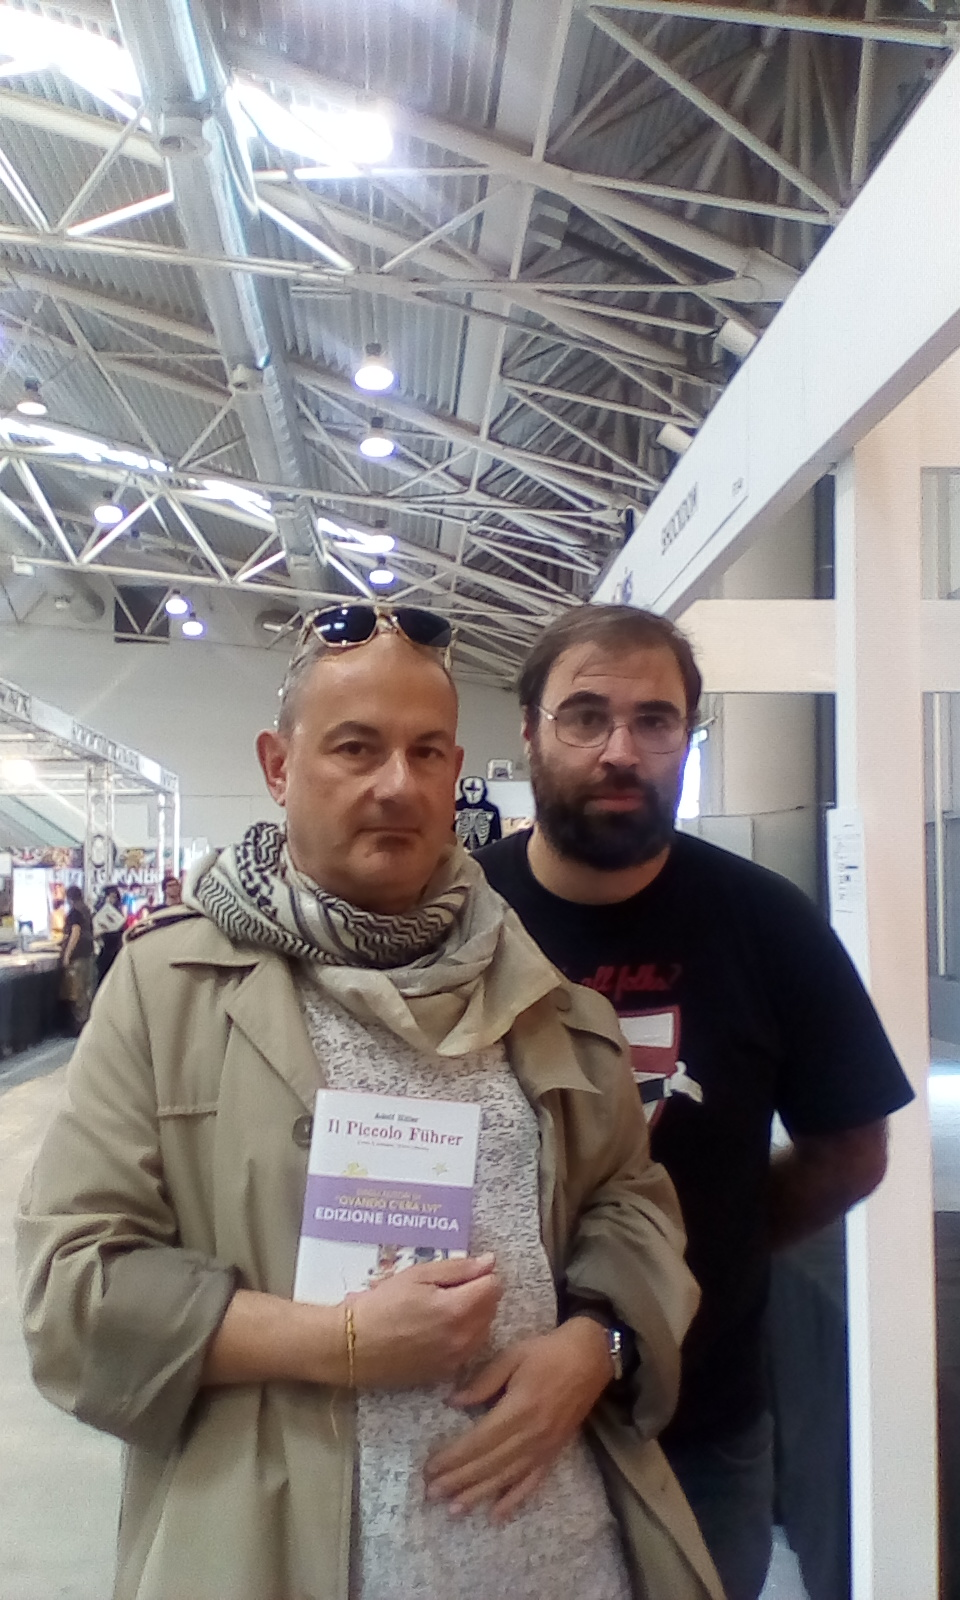 Courarelli in fiera de roma,romics comics festival 4/10/18